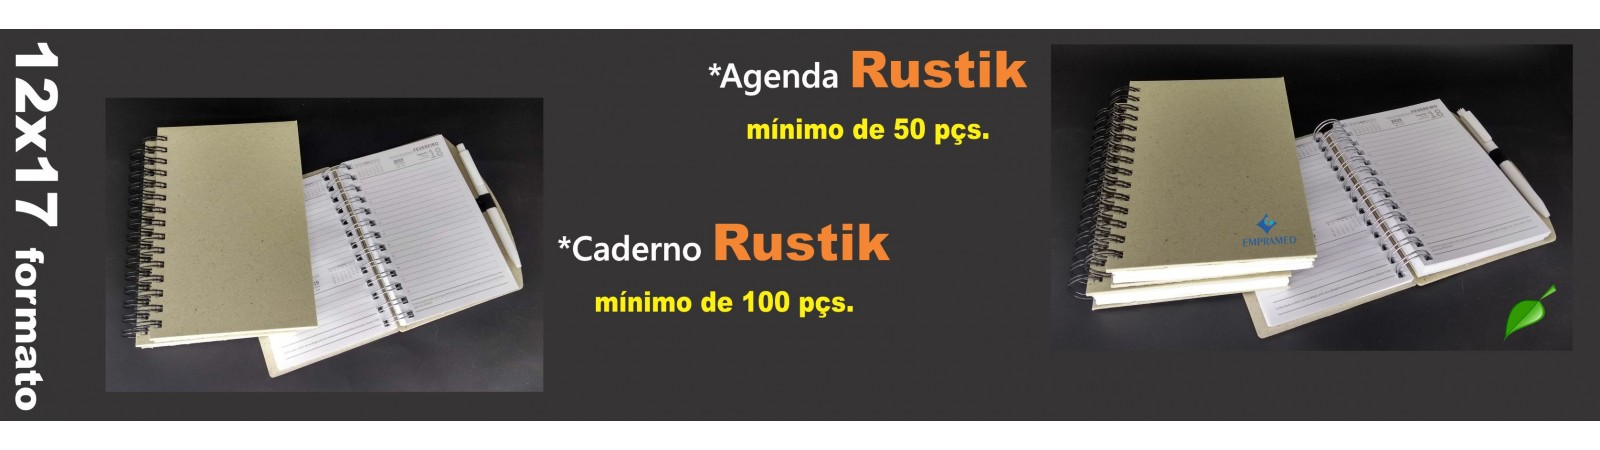 Agenda Caderno Rustik